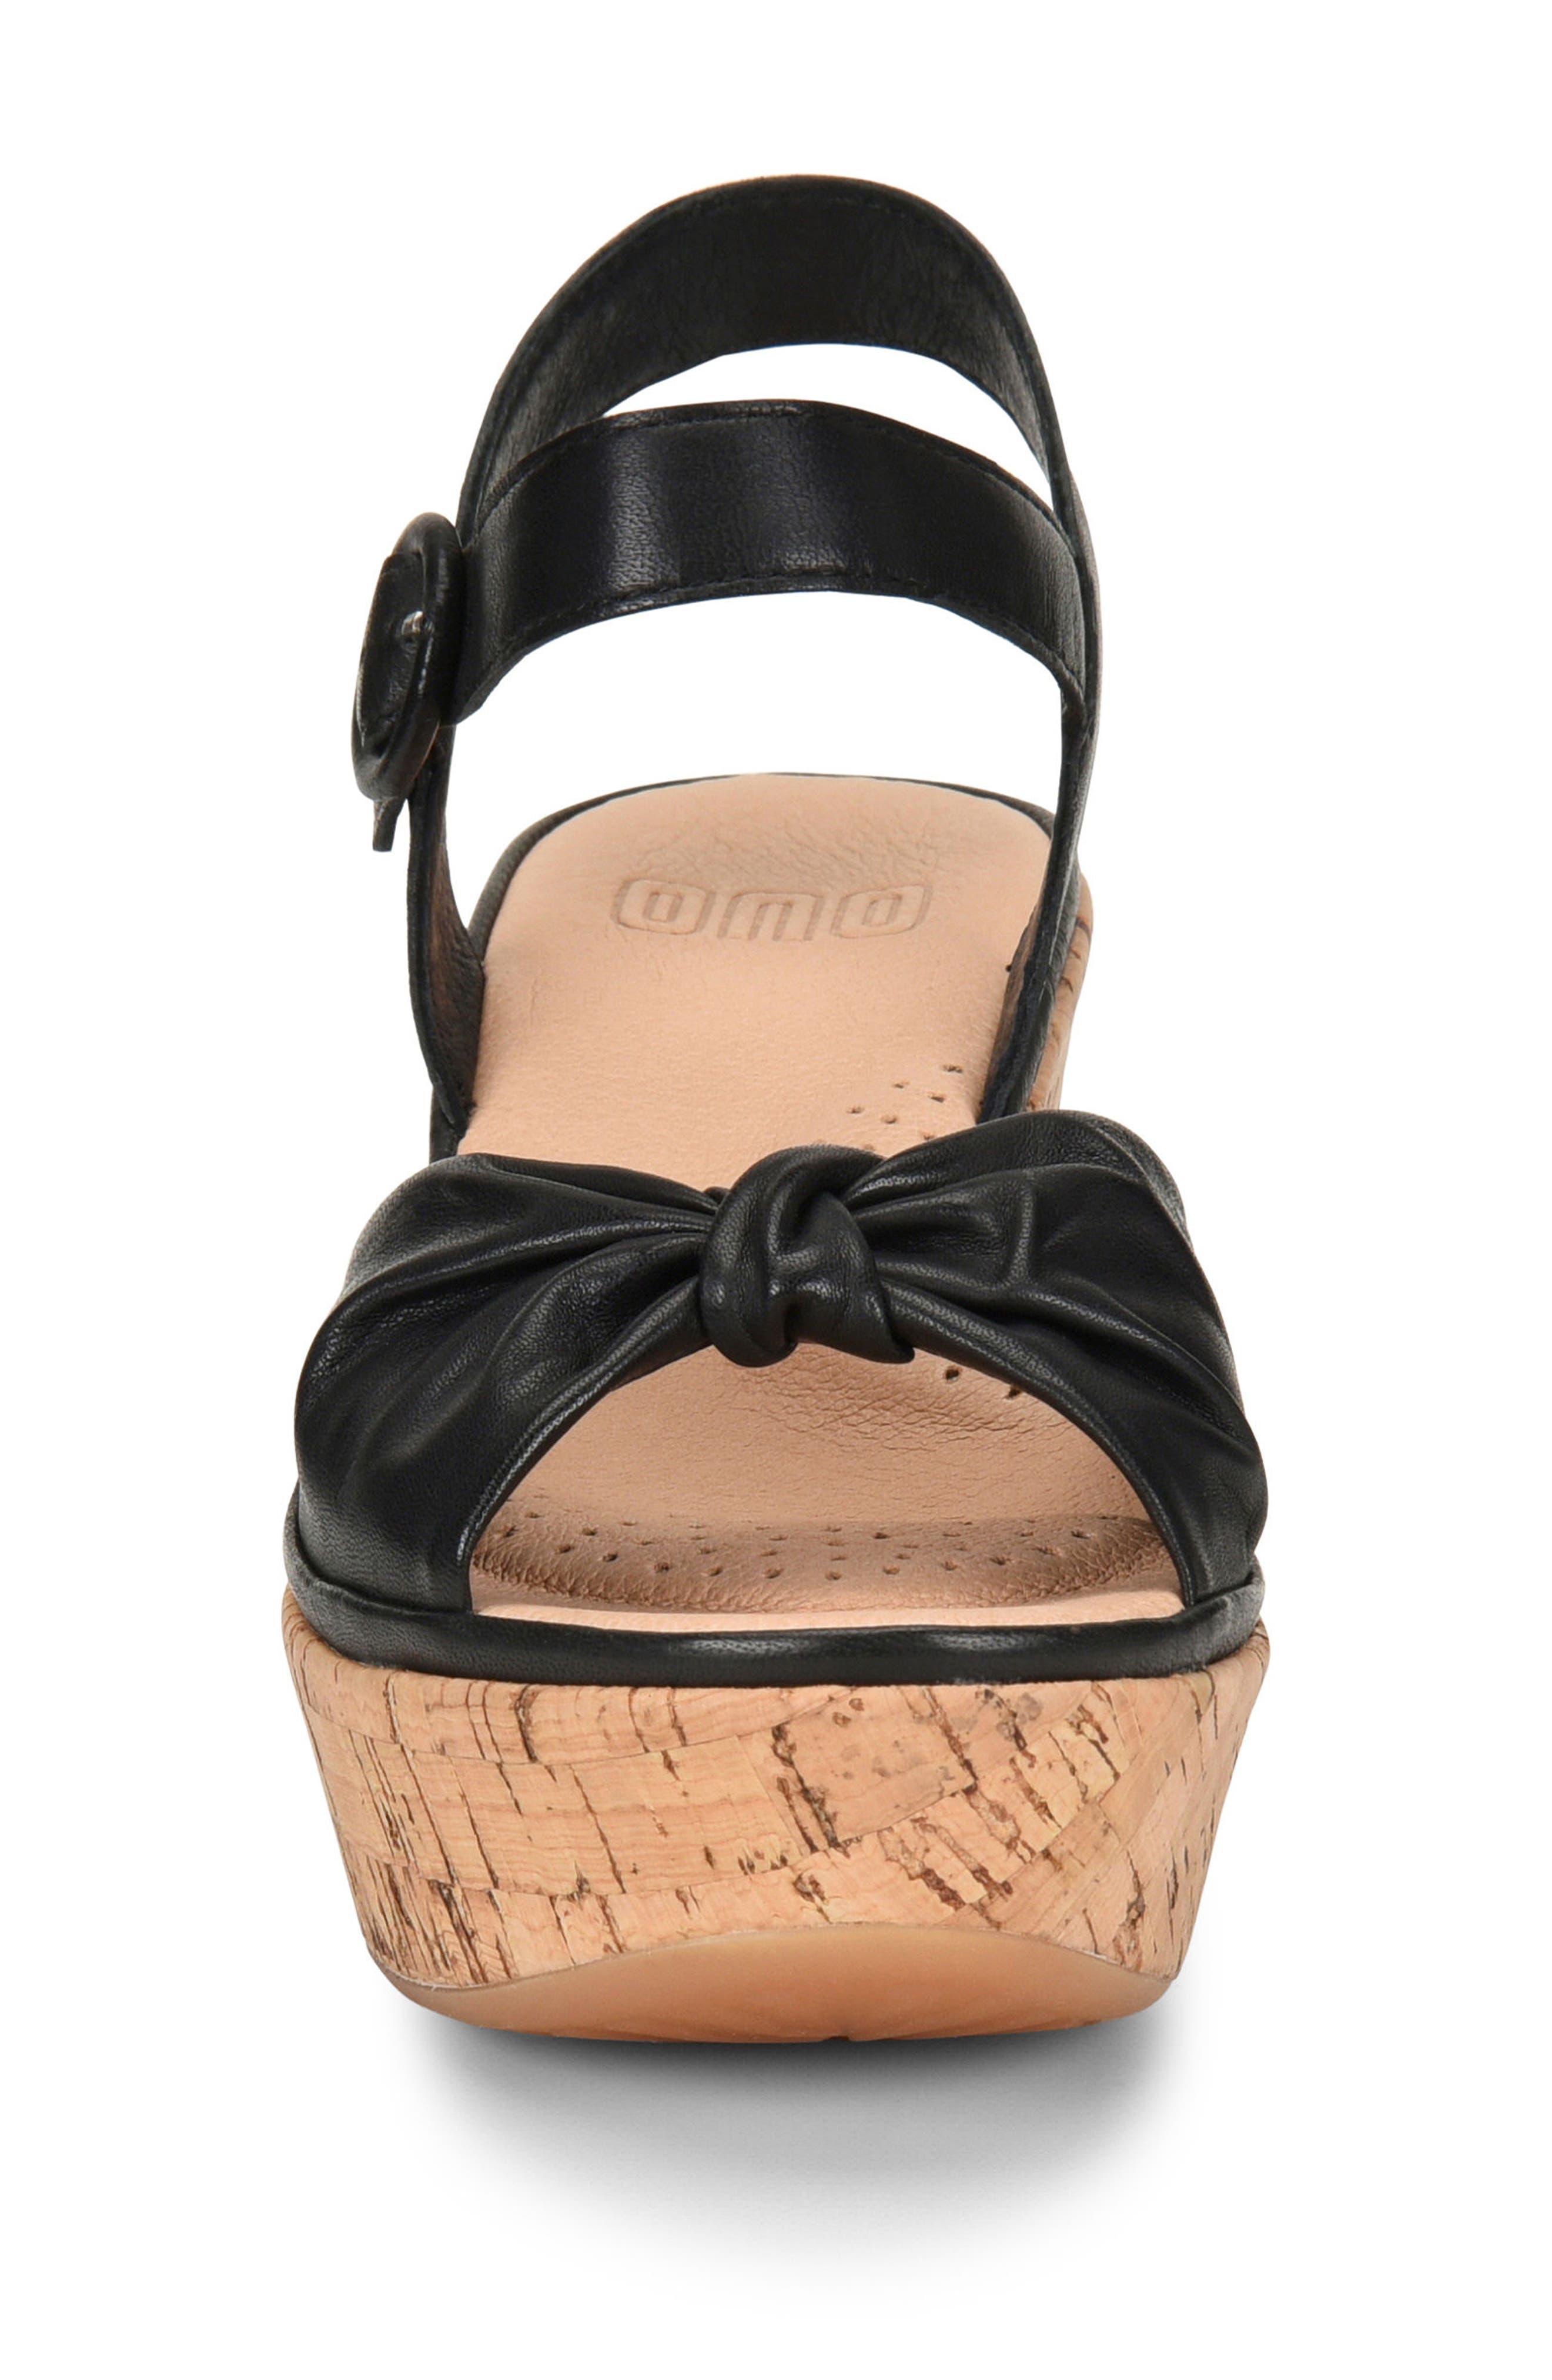 ONO, Heavenly Platform Wedge Sandal, Alternate thumbnail 4, color, BLACK LEATHER